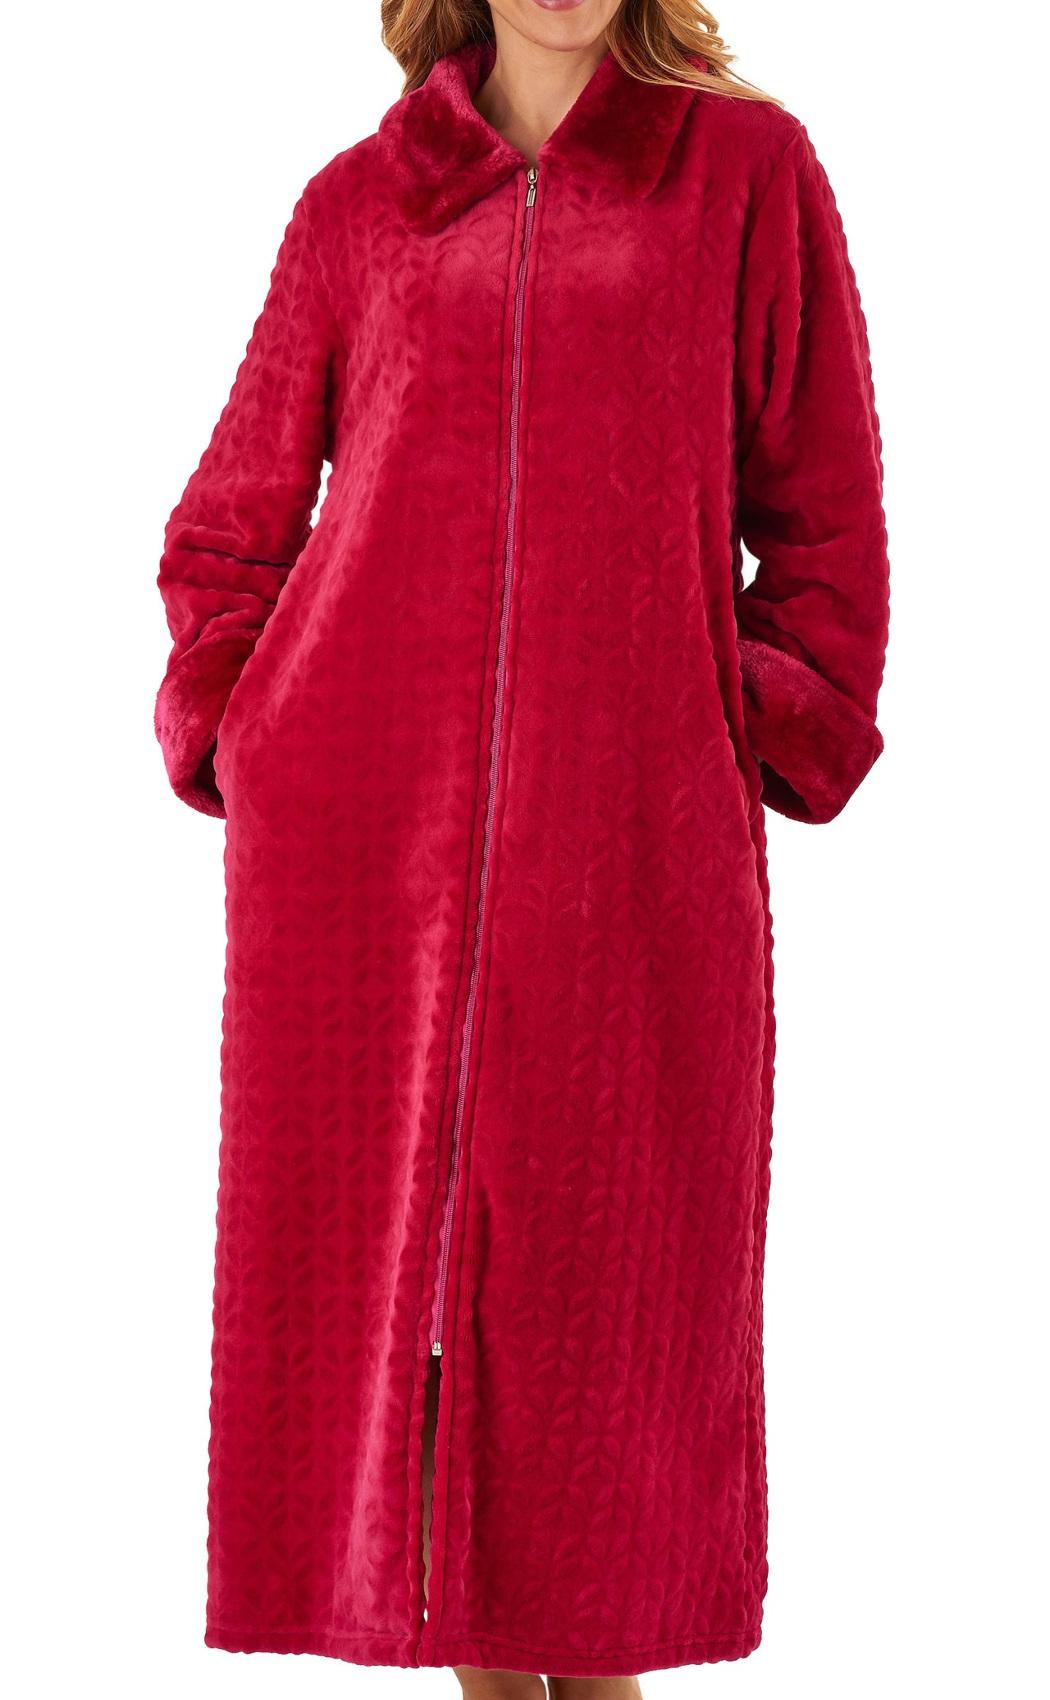 Dressing Gown Womens Soft Faux Fur Zip Up Bathrobe Slenderella